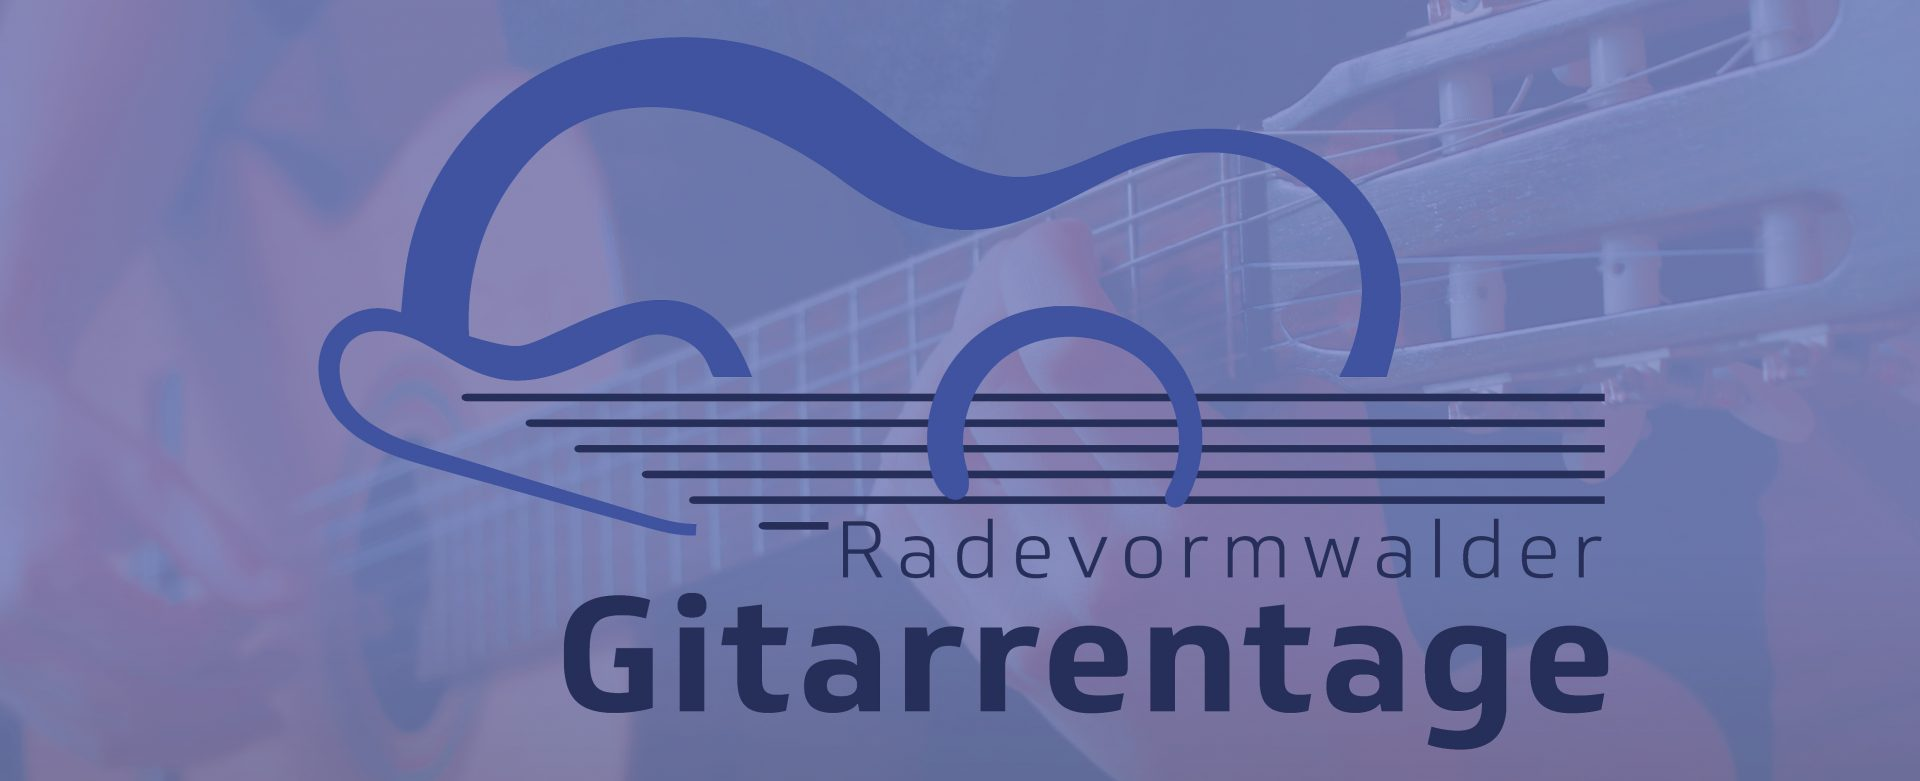 Radevormwalder Gitarrentage 2020